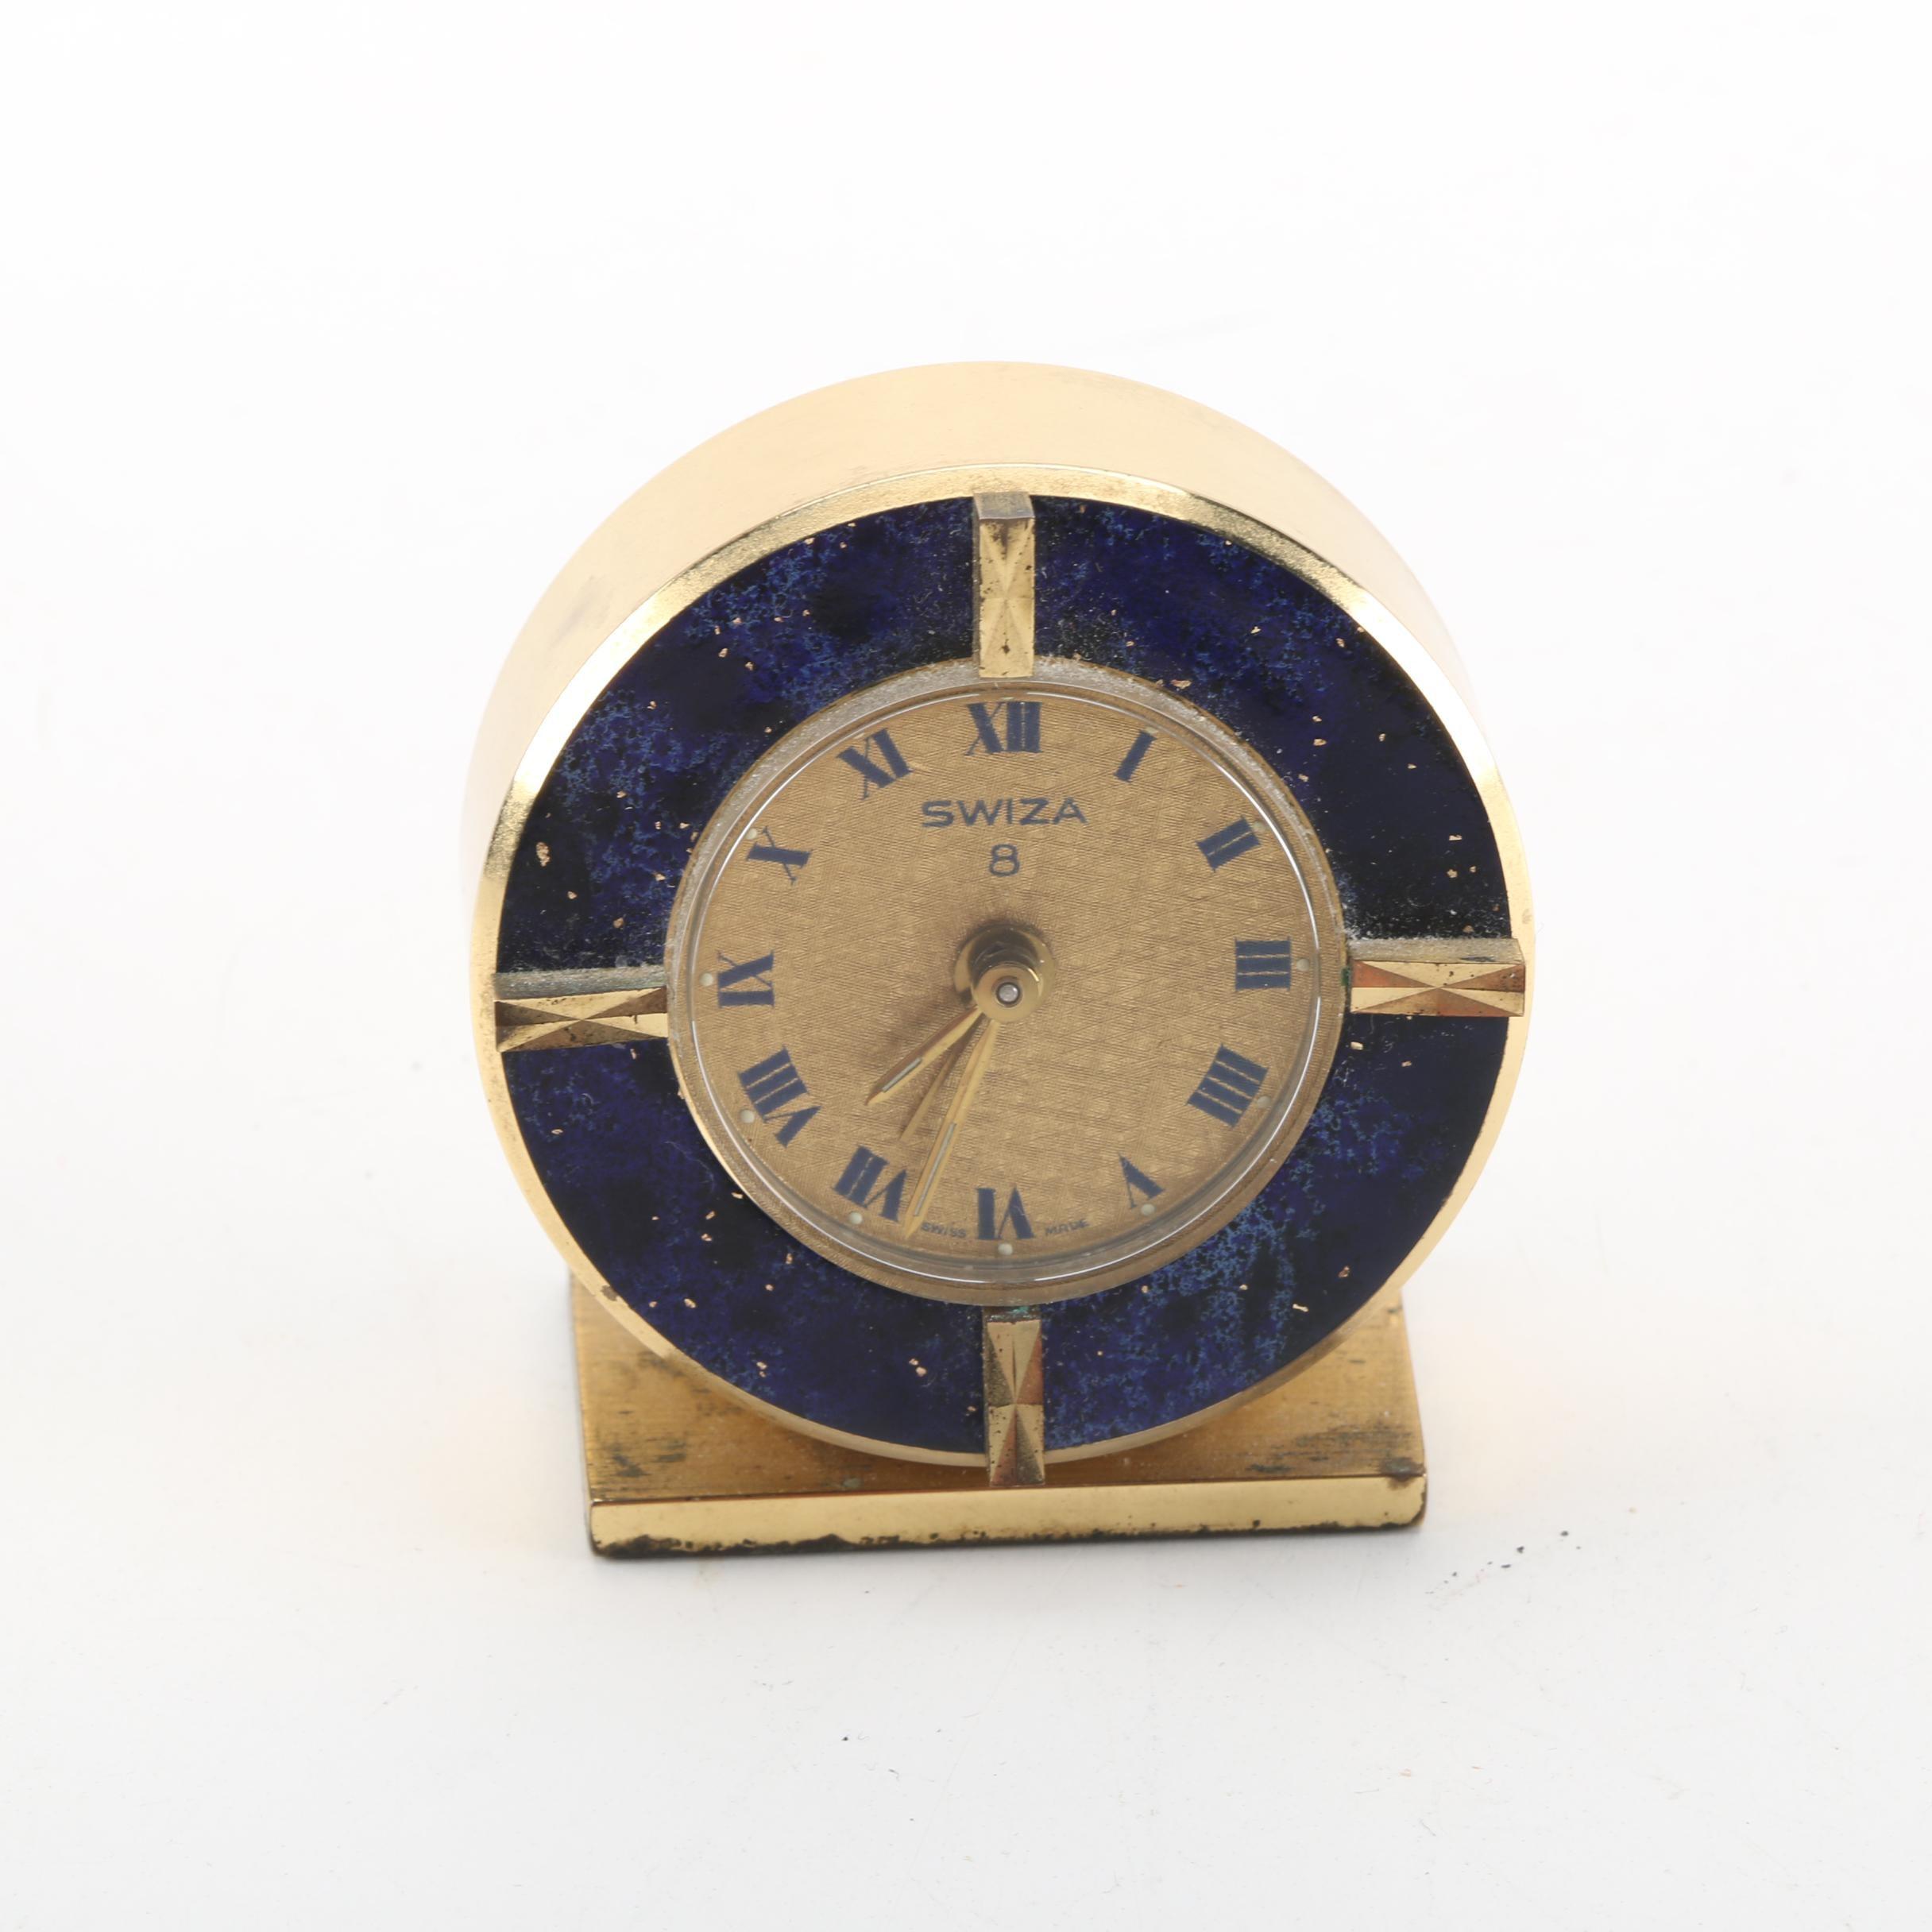 Vintage Swiza Alarm Clock